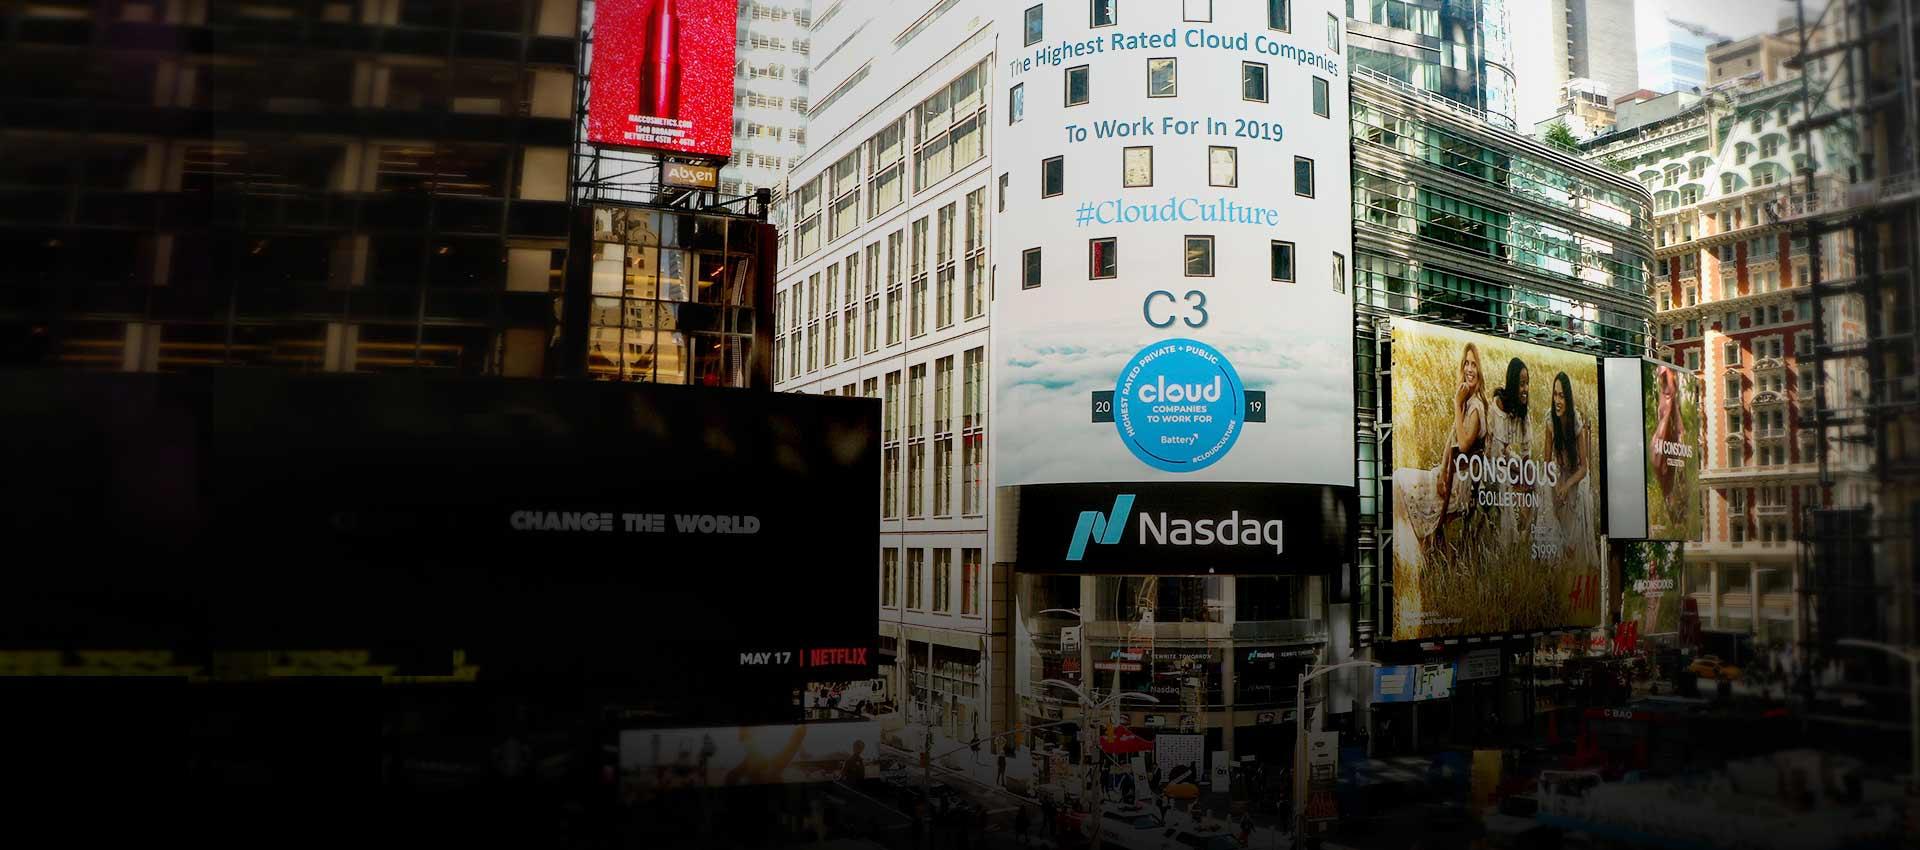 C3.ai named a highest-rated cloud company